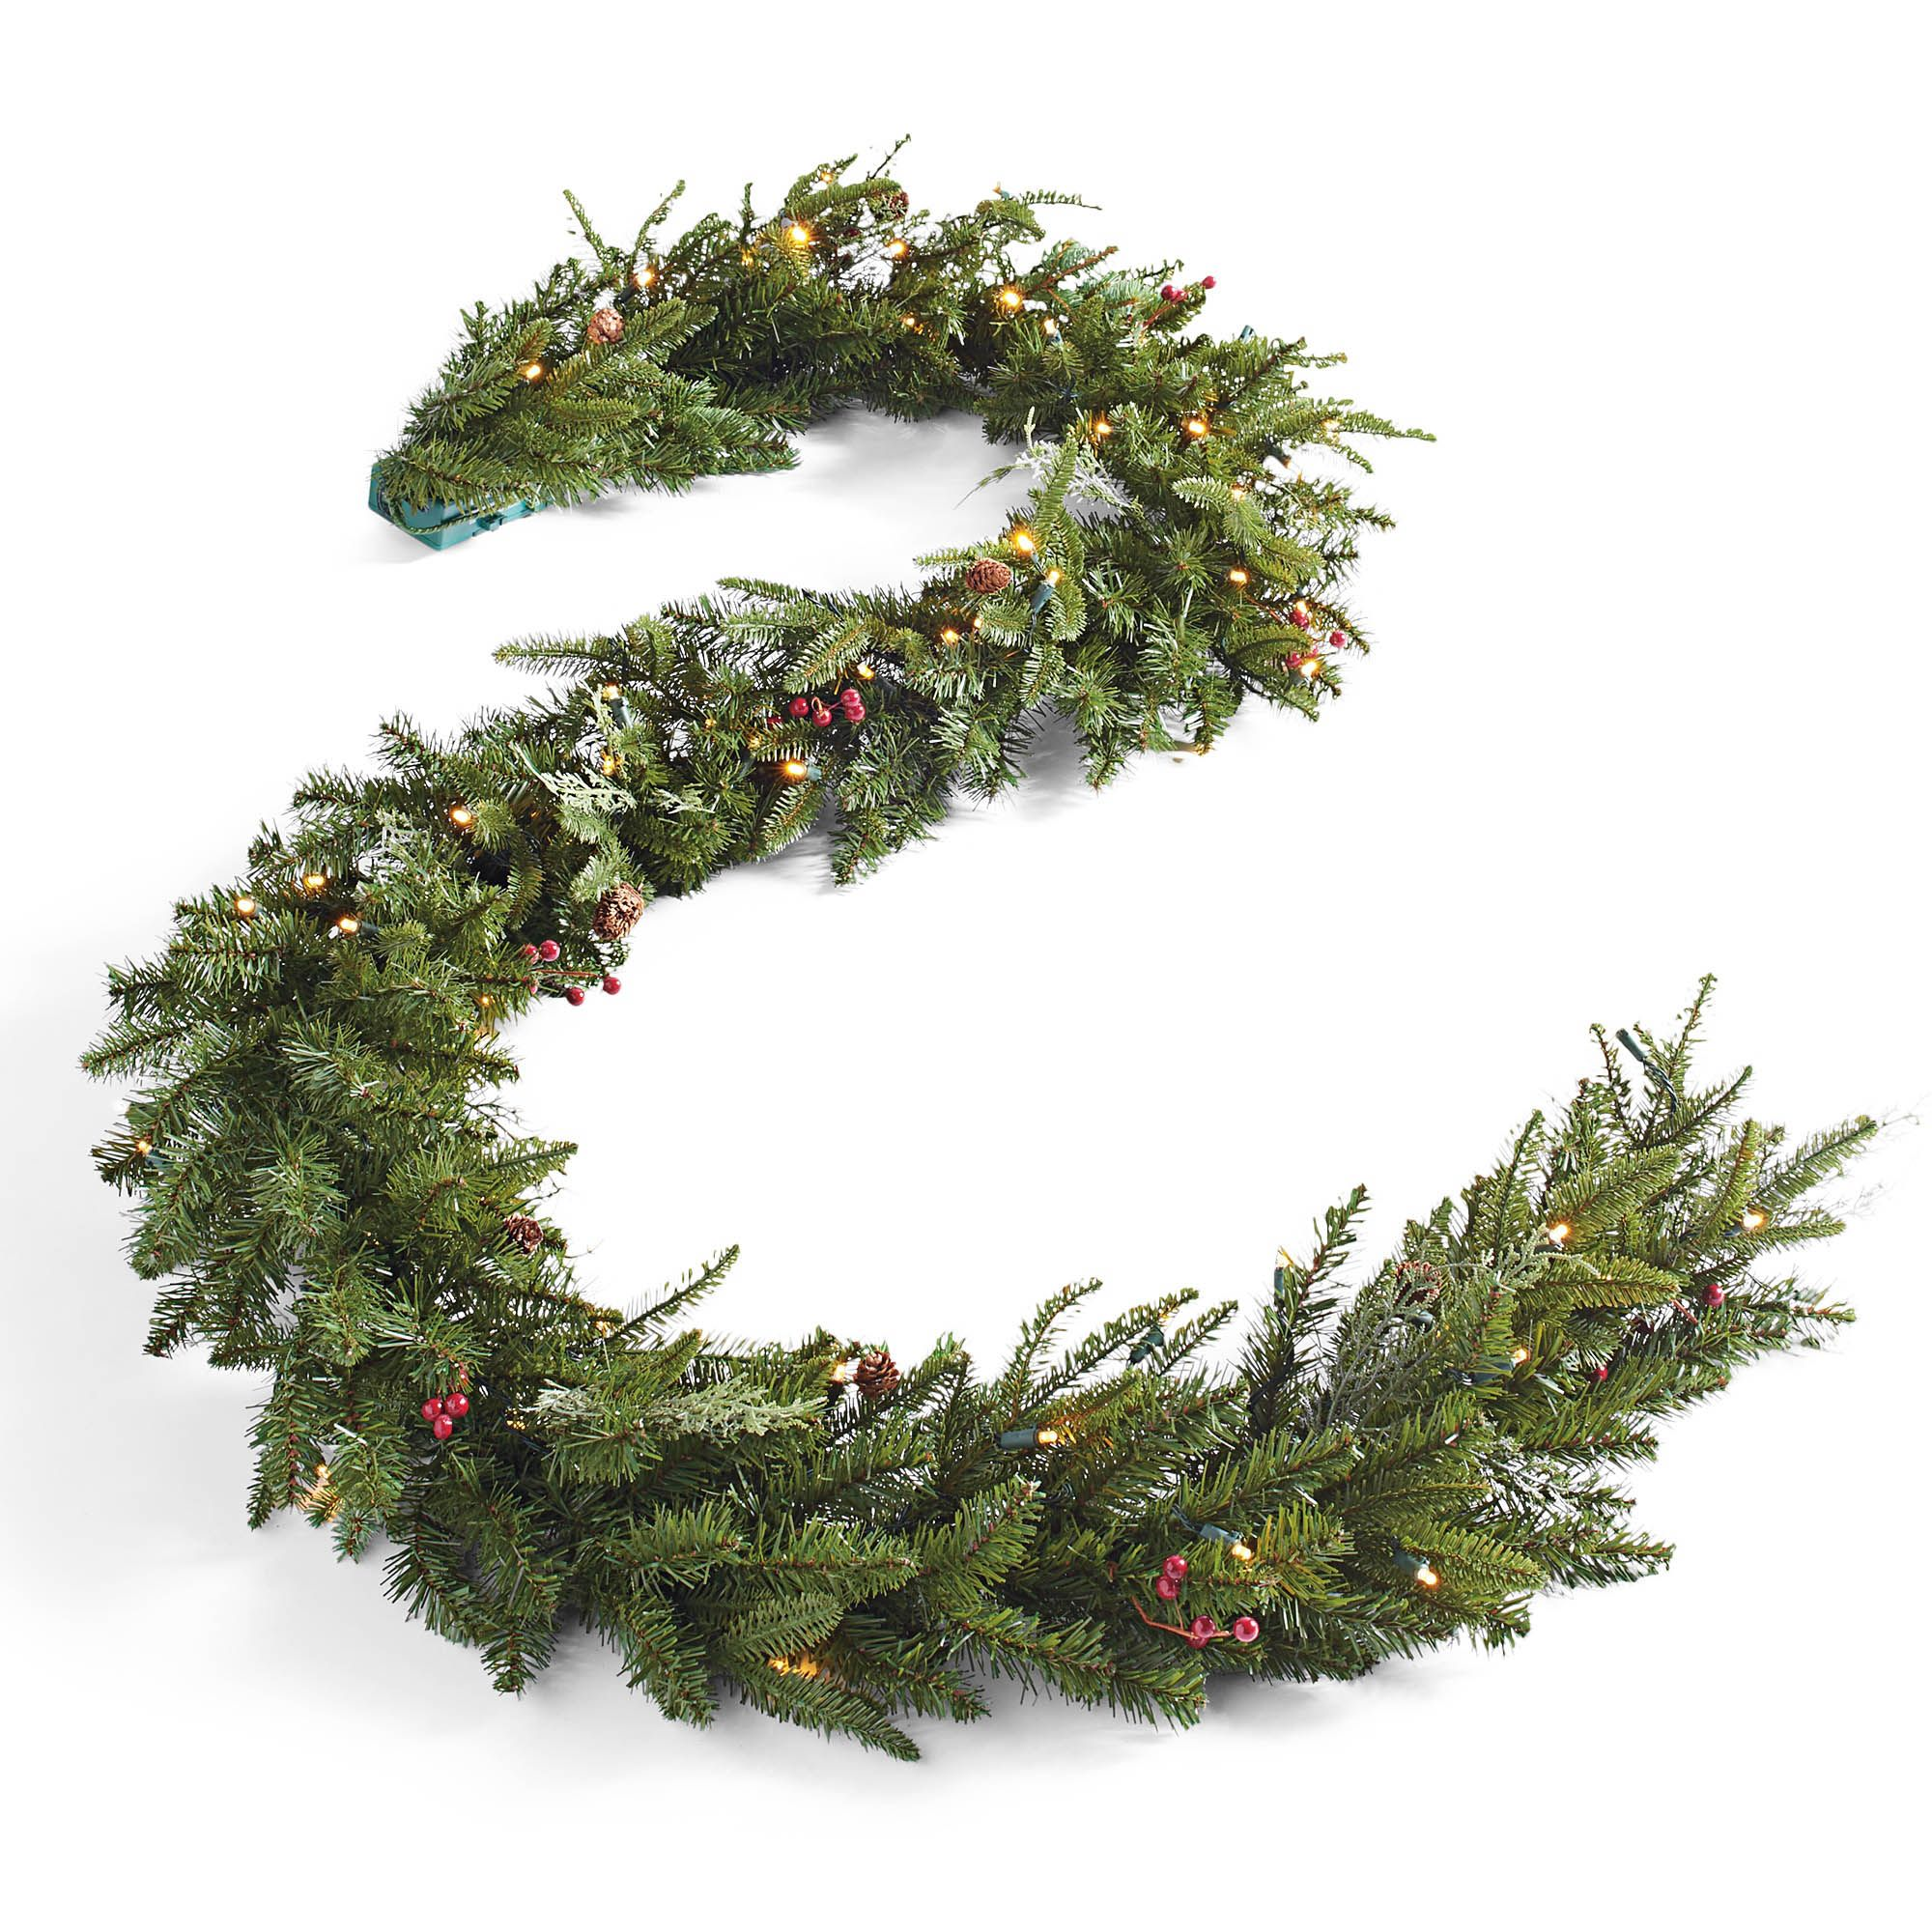 50+ Outdoor Christmas Decoration Ideas - Stylish Outside Christmas ...